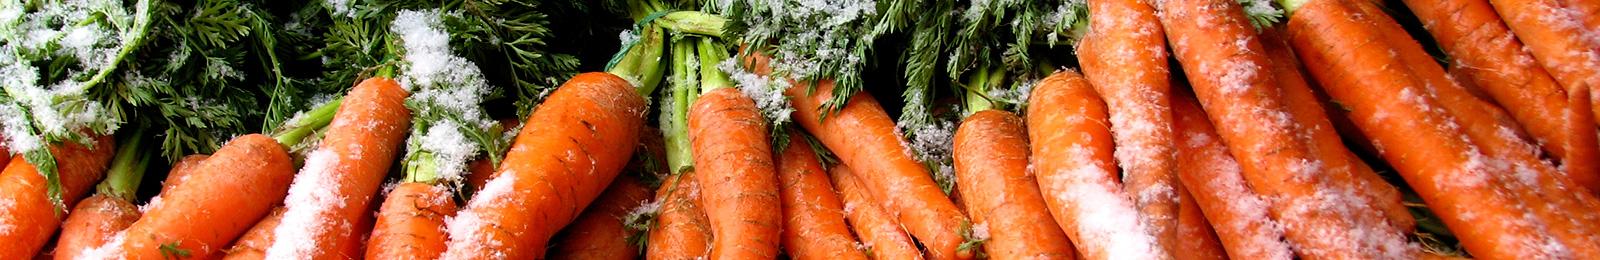 Frost Tolerance of Vegetables